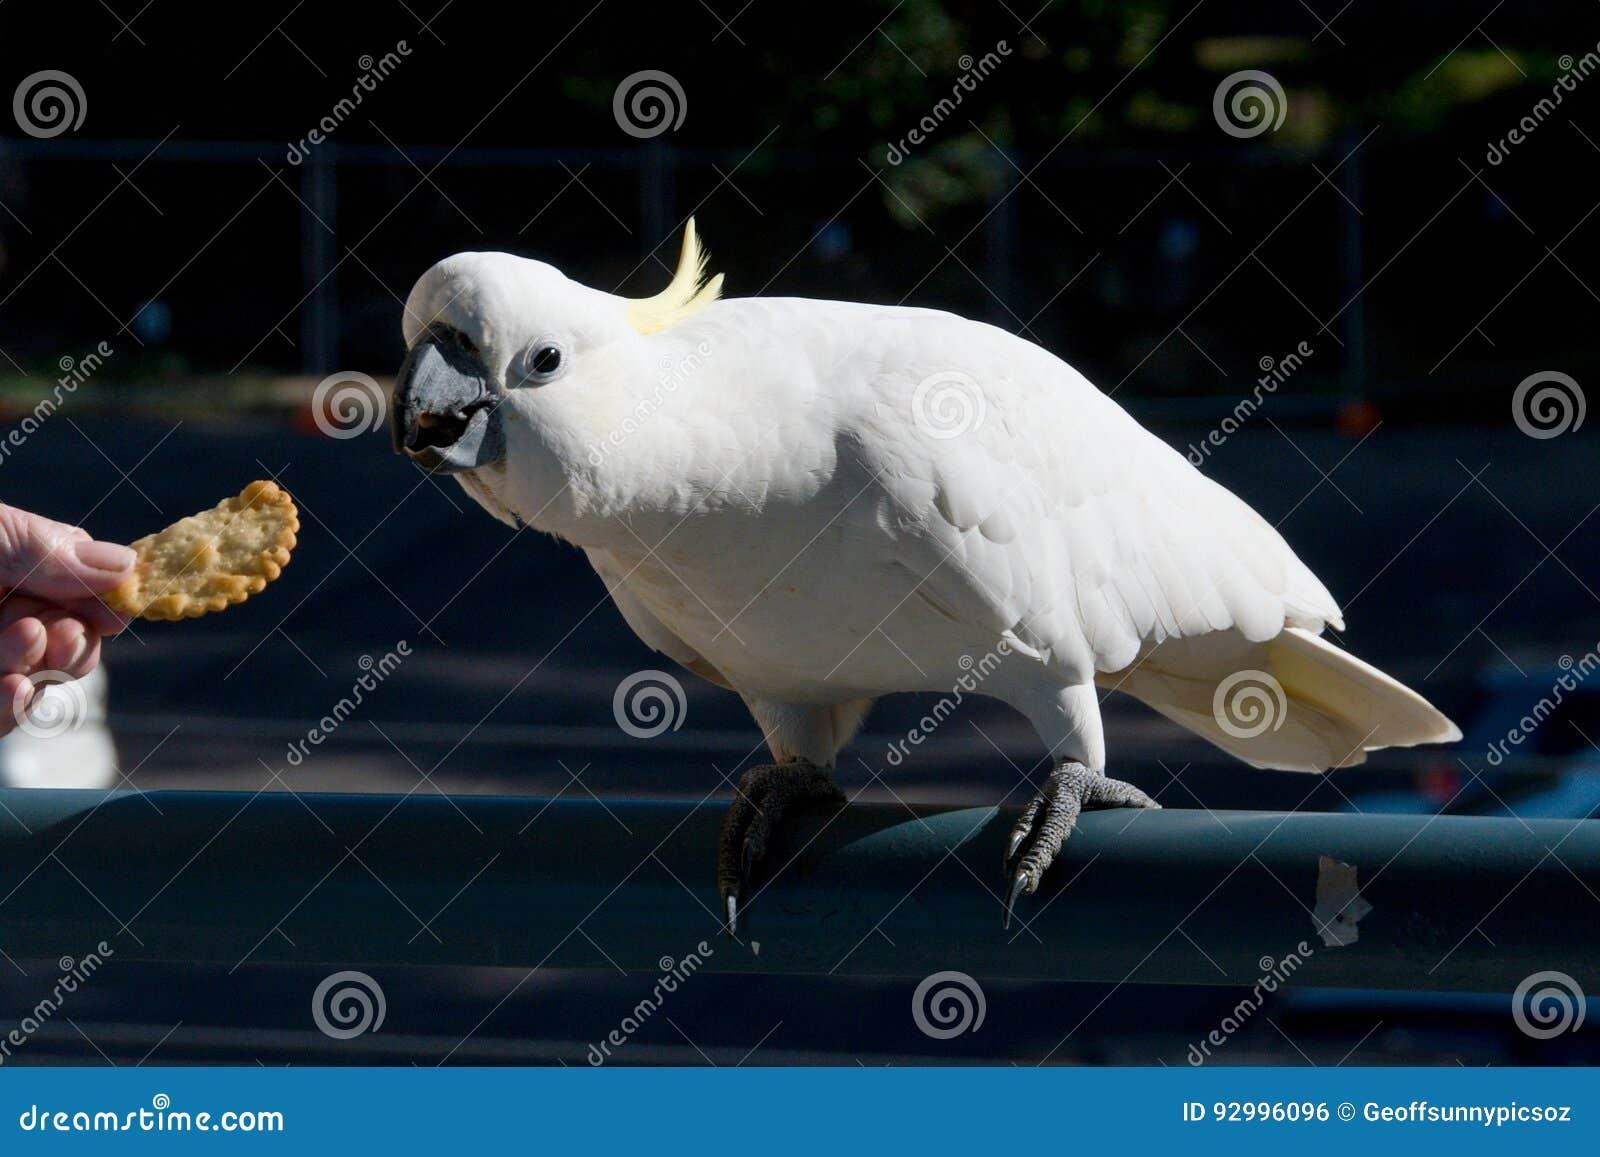 Australian Sulphur-crested Cockatoo being fed a cracker. Cacatu